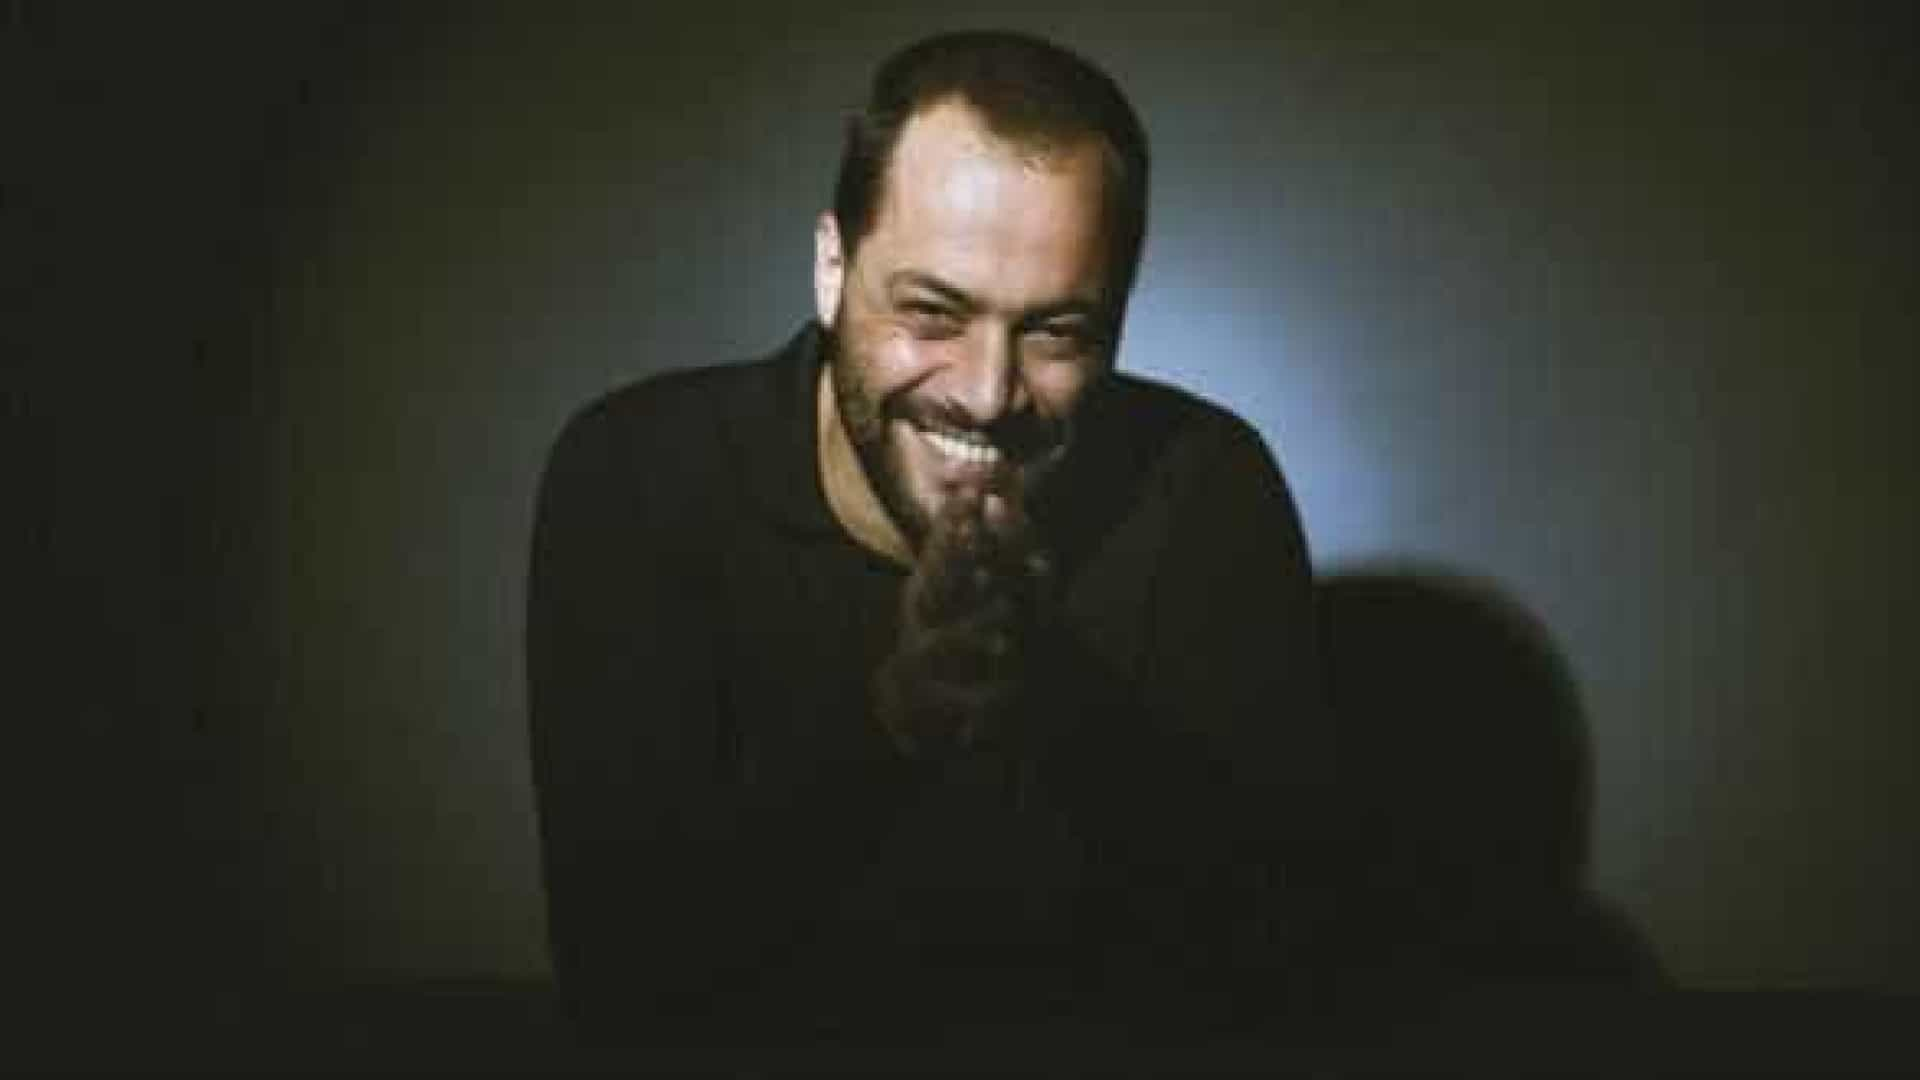 Língua Franca e António Zambujo nomeados para prémios Grammy Latino